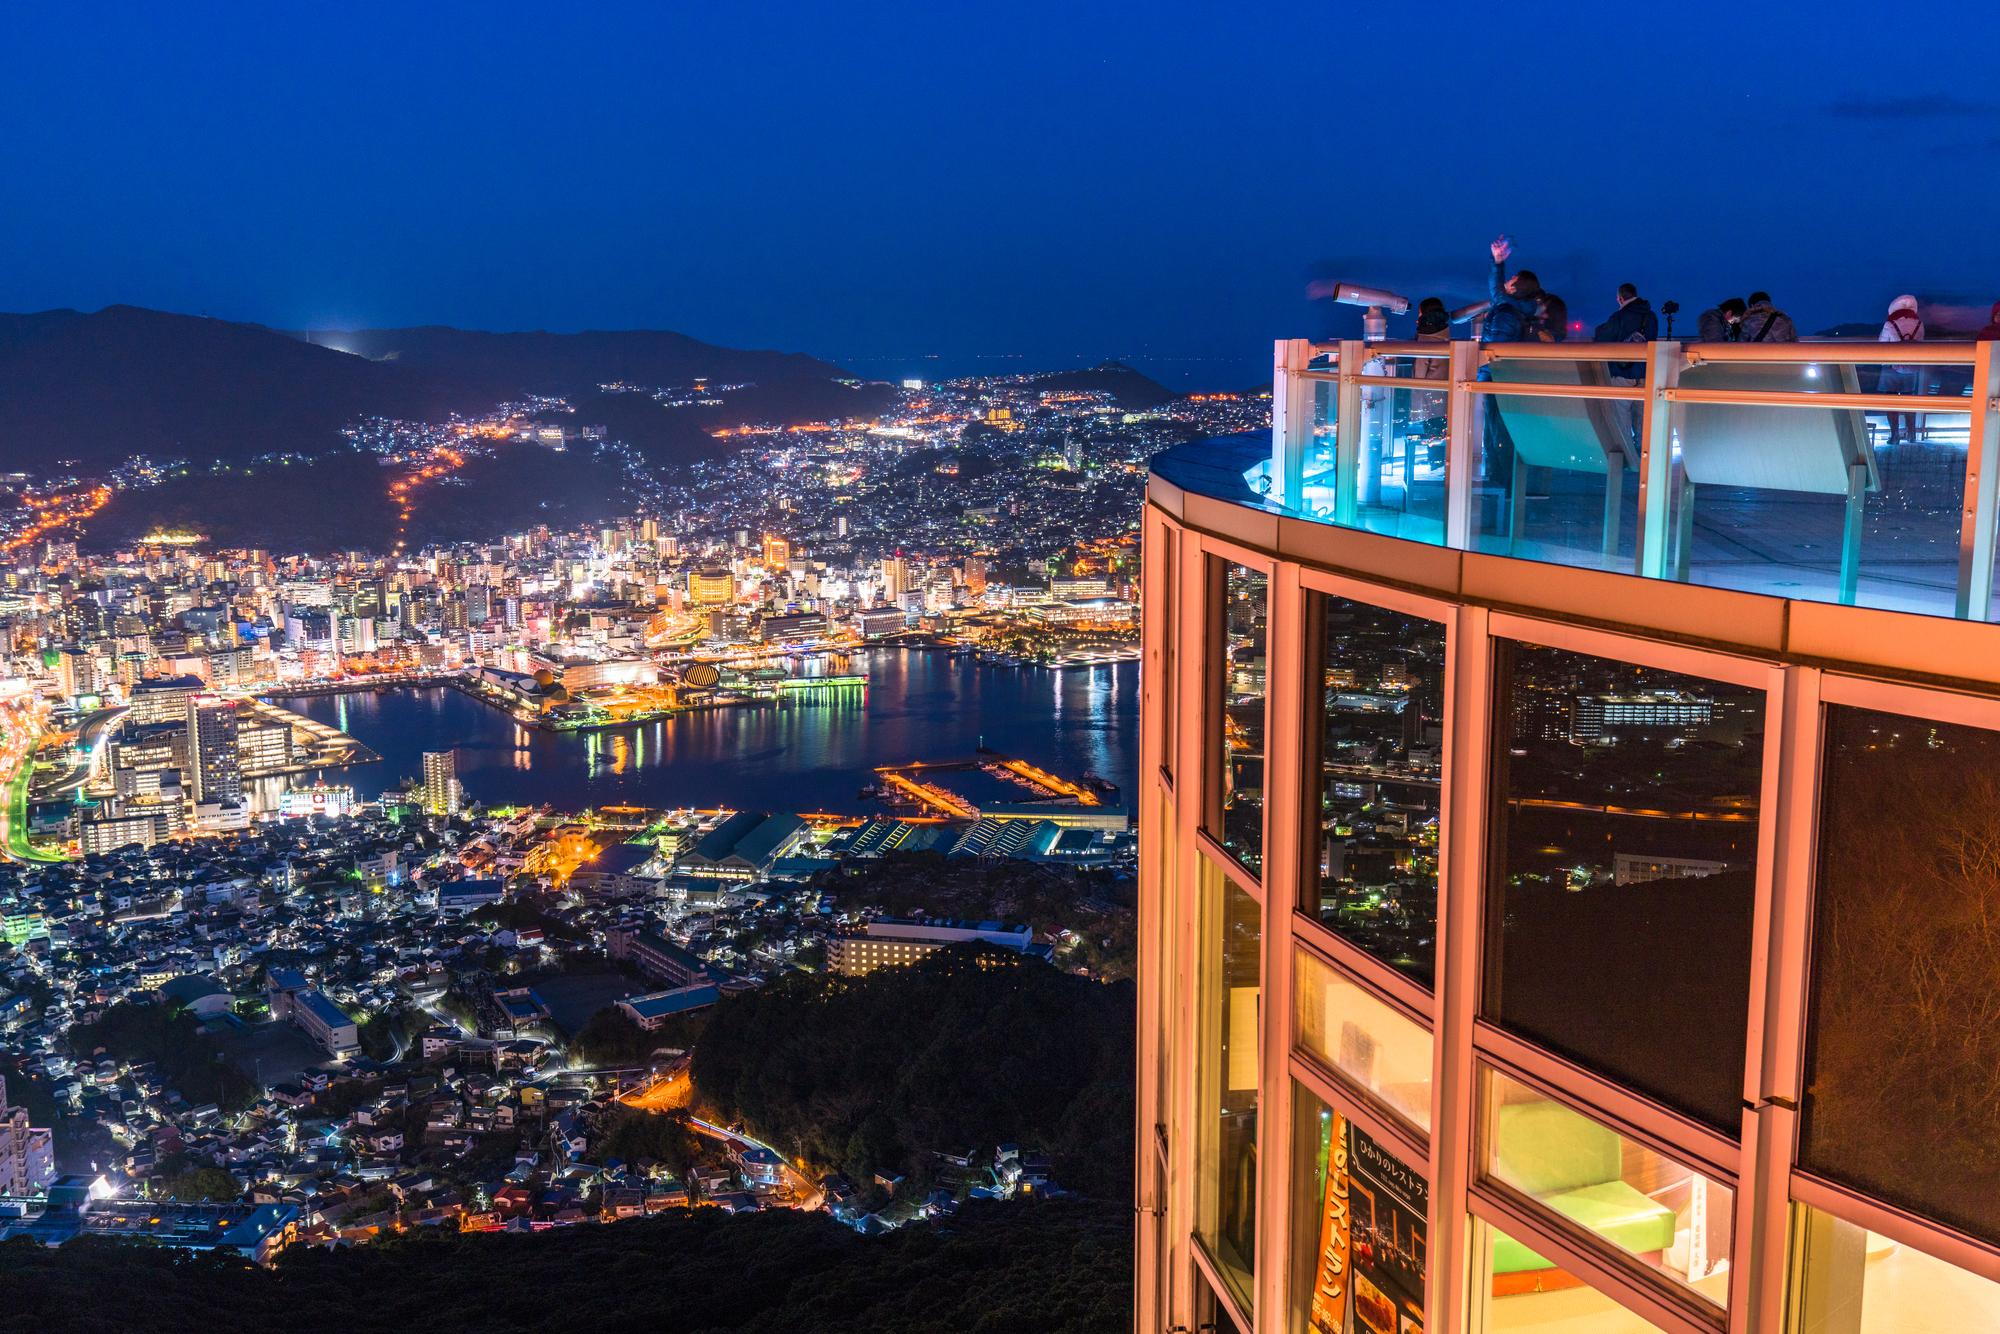 "<span class=""title"">長崎で一番見たい稲佐山の夜景、観光スポットと周辺ホテル選びのコツ</span>"